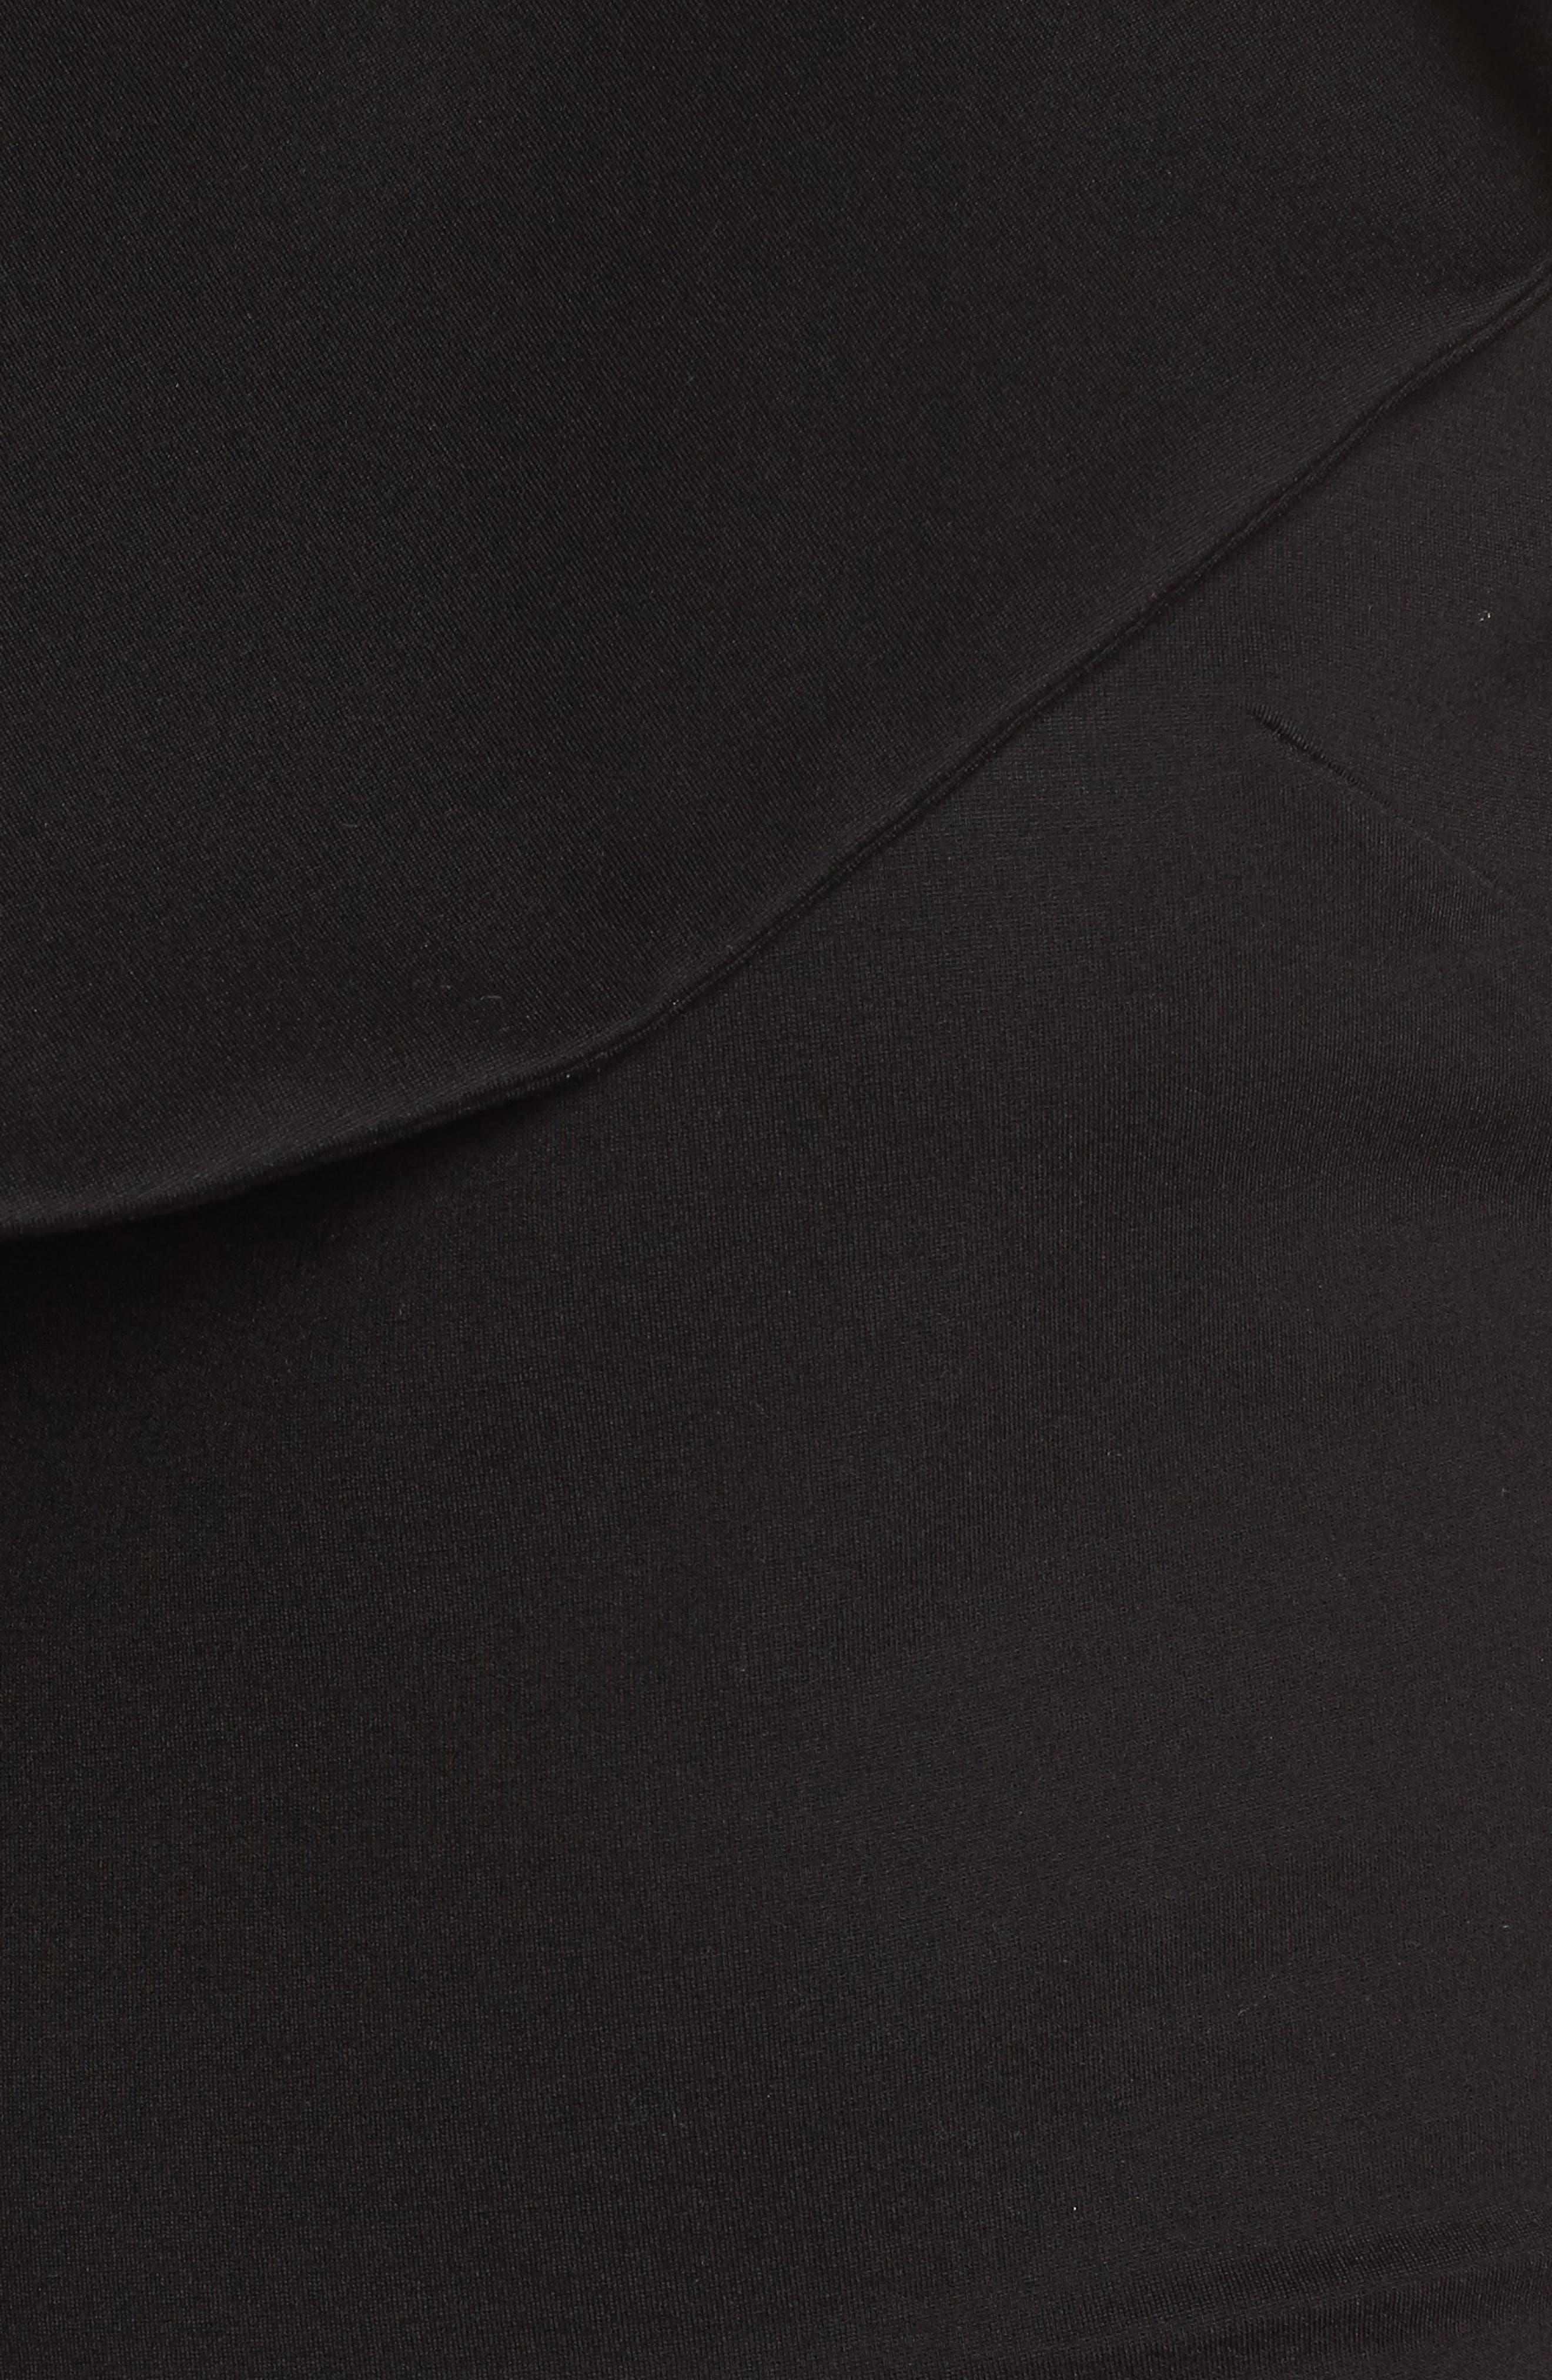 Revel One-Shoulder Top,                             Alternate thumbnail 5, color,                             Black